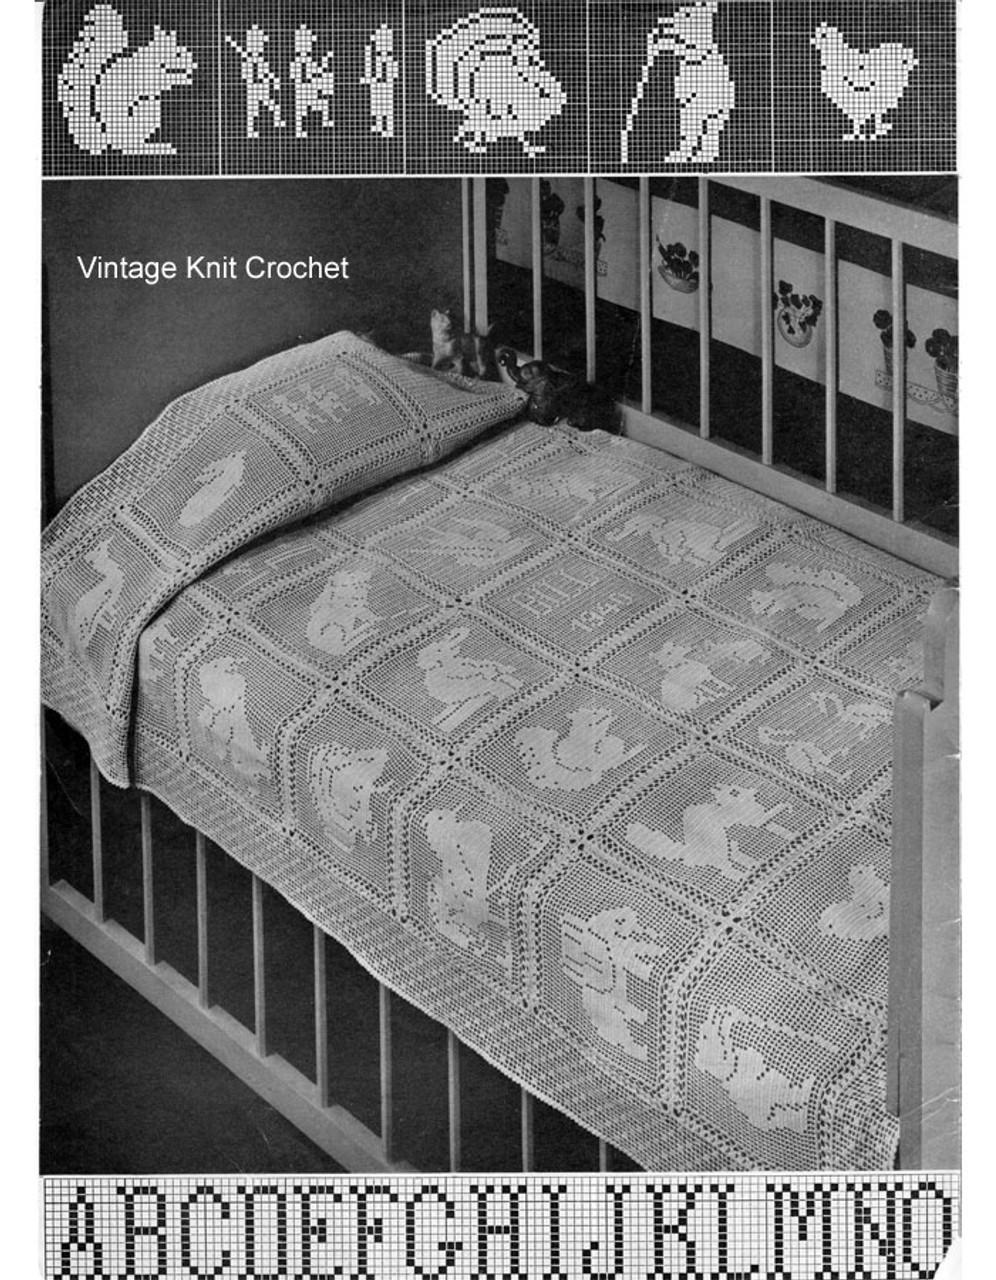 filet crochet baby blanket pattern with animal motifs